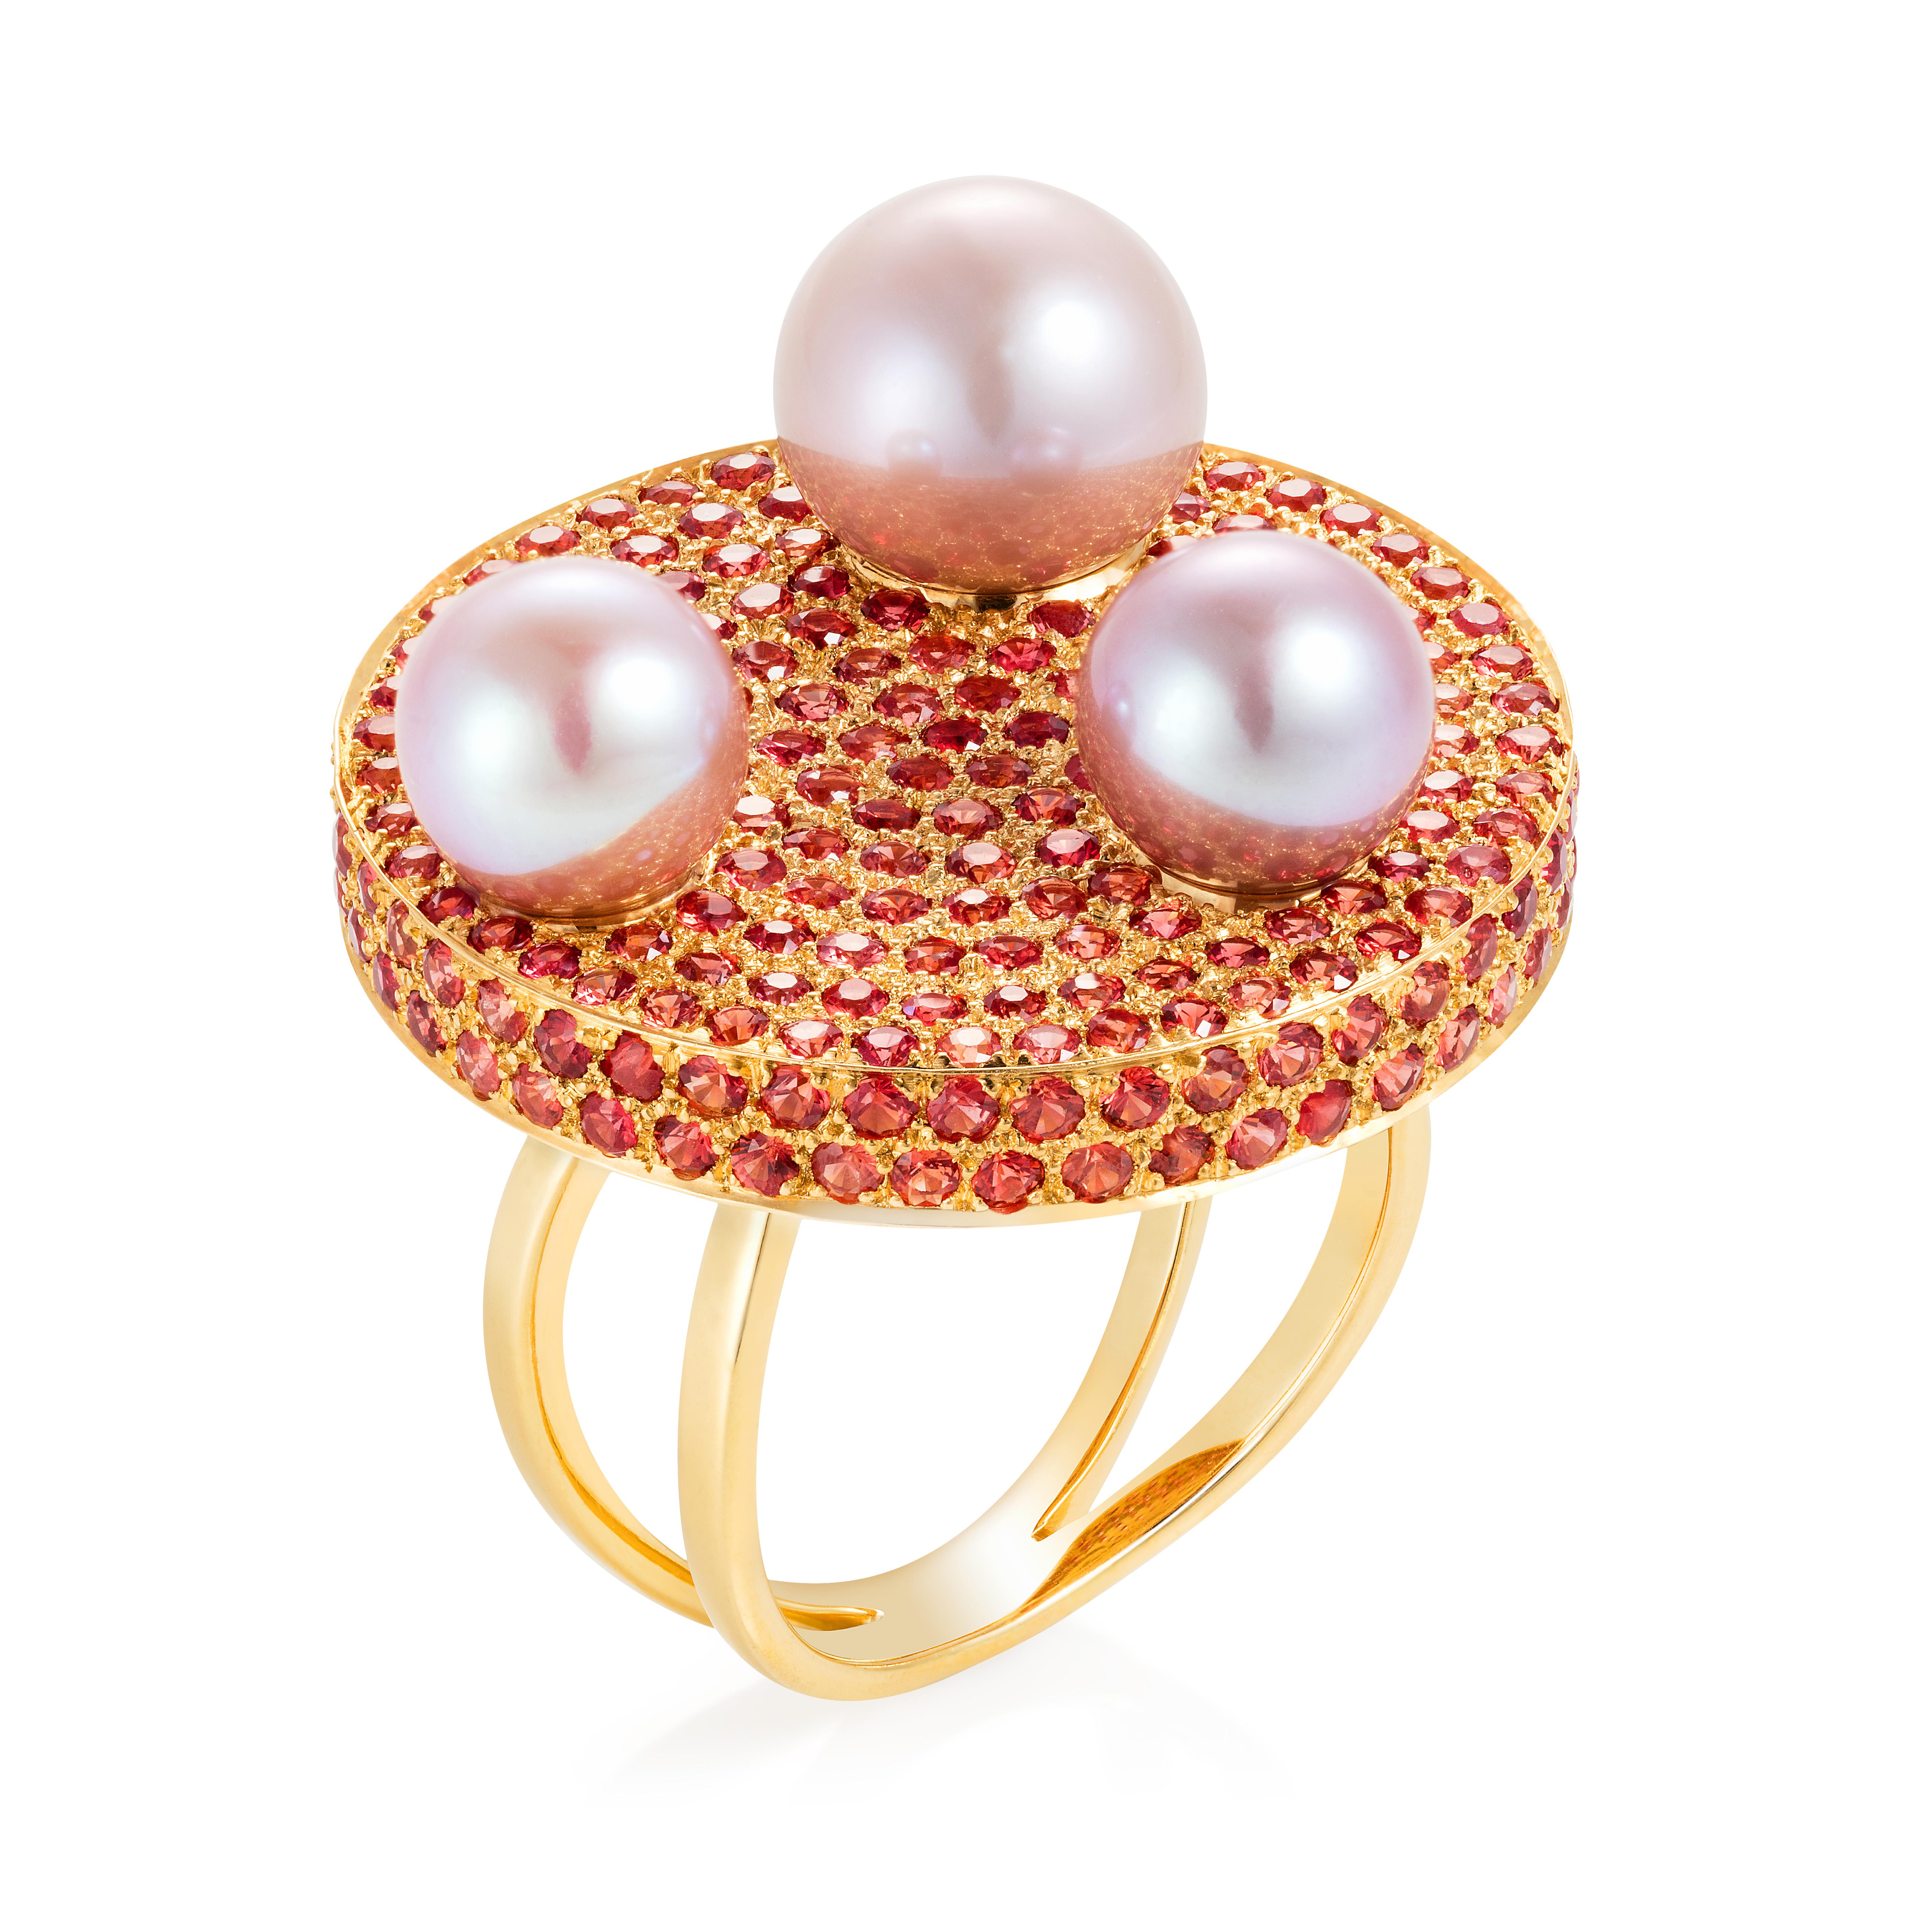 Saengduan Disc Ring – Orange Sapphires And Fancy Pearls 18k Gold